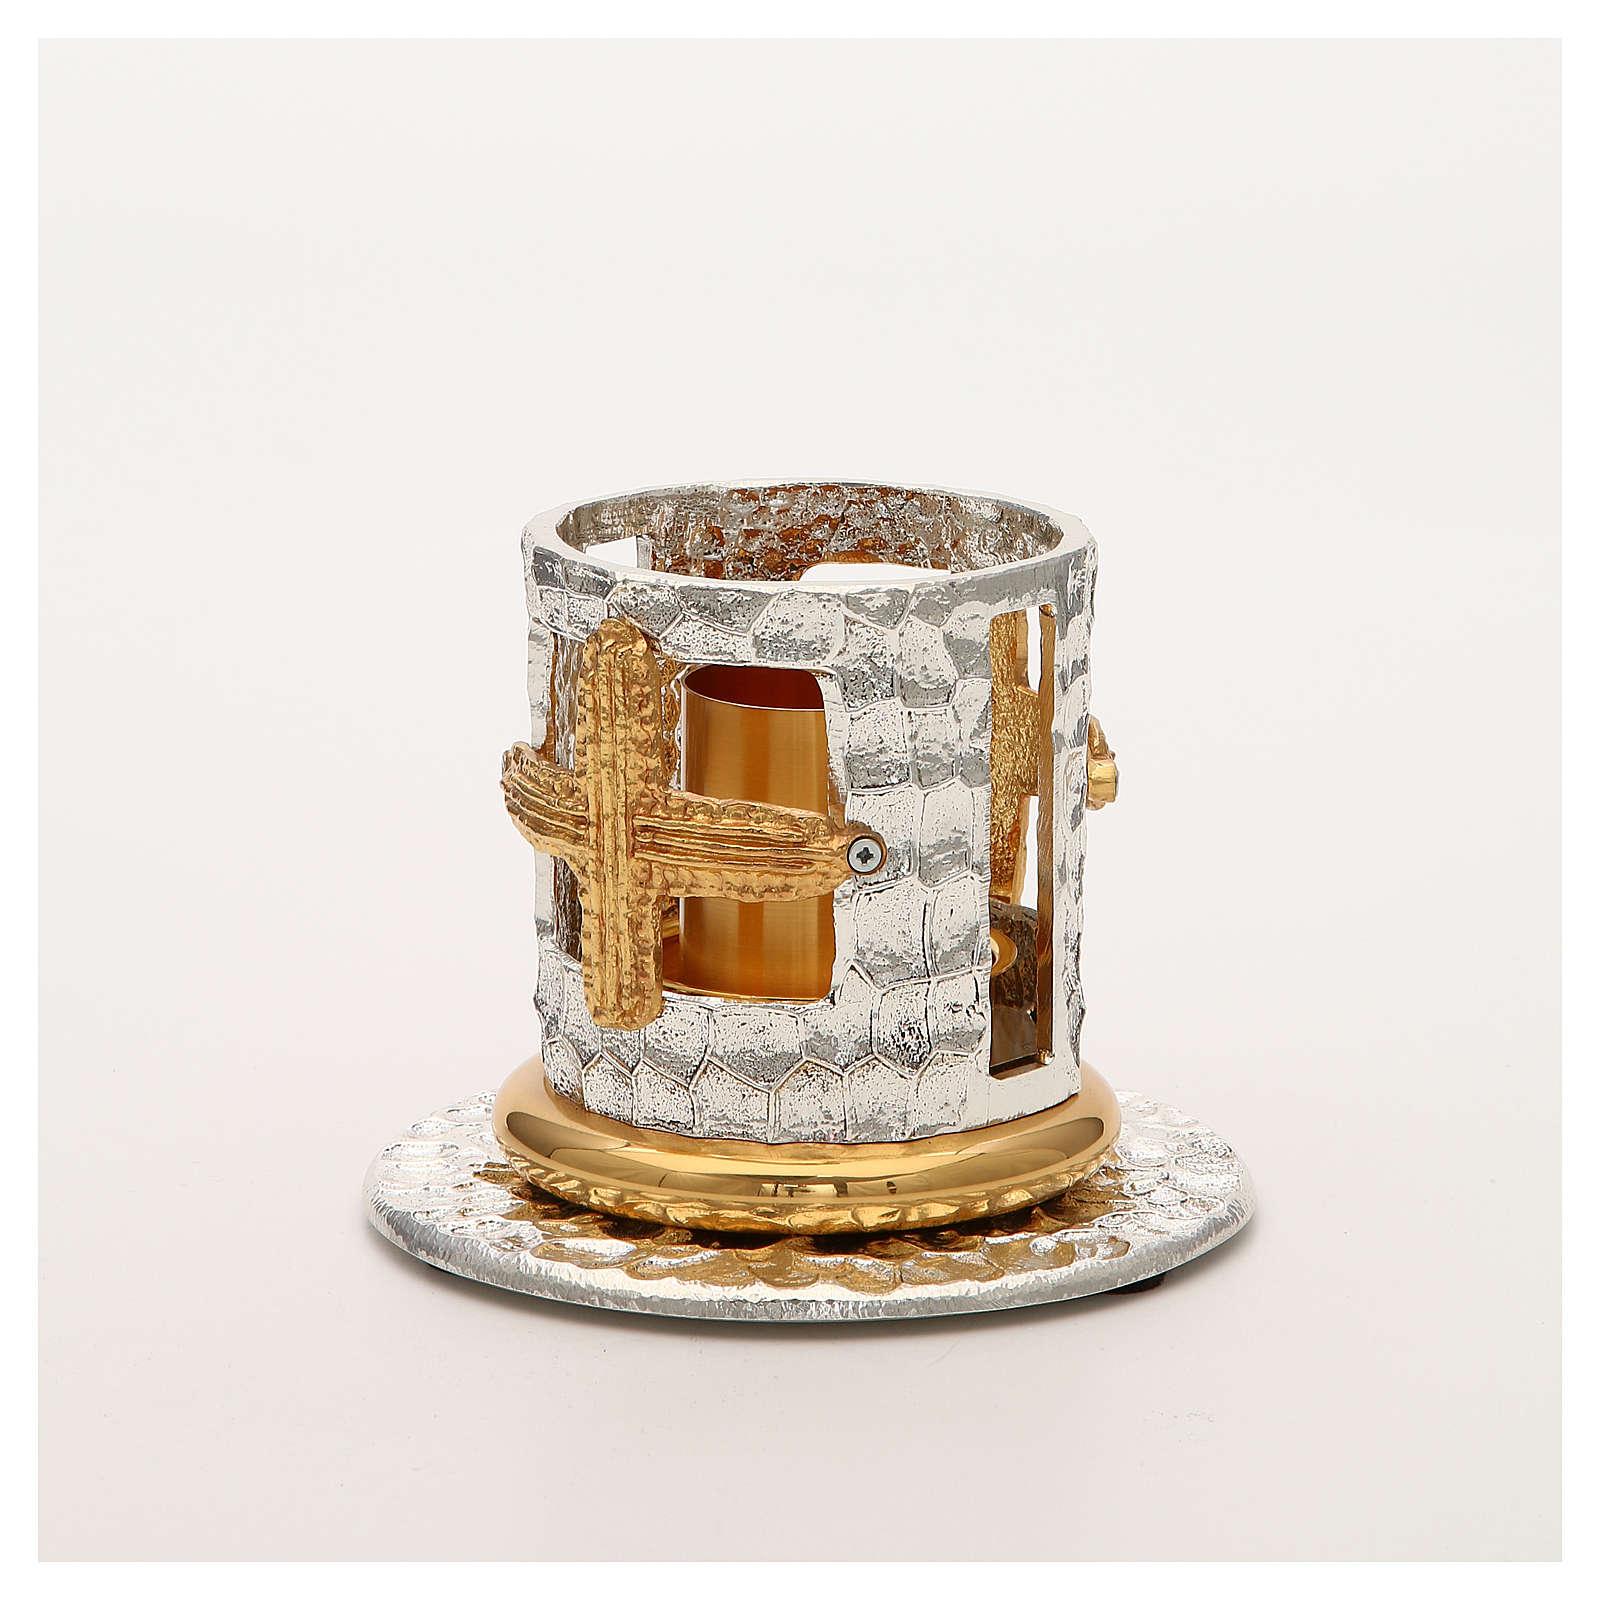 Portacandela bronzo argentato dorato croci decorate 4